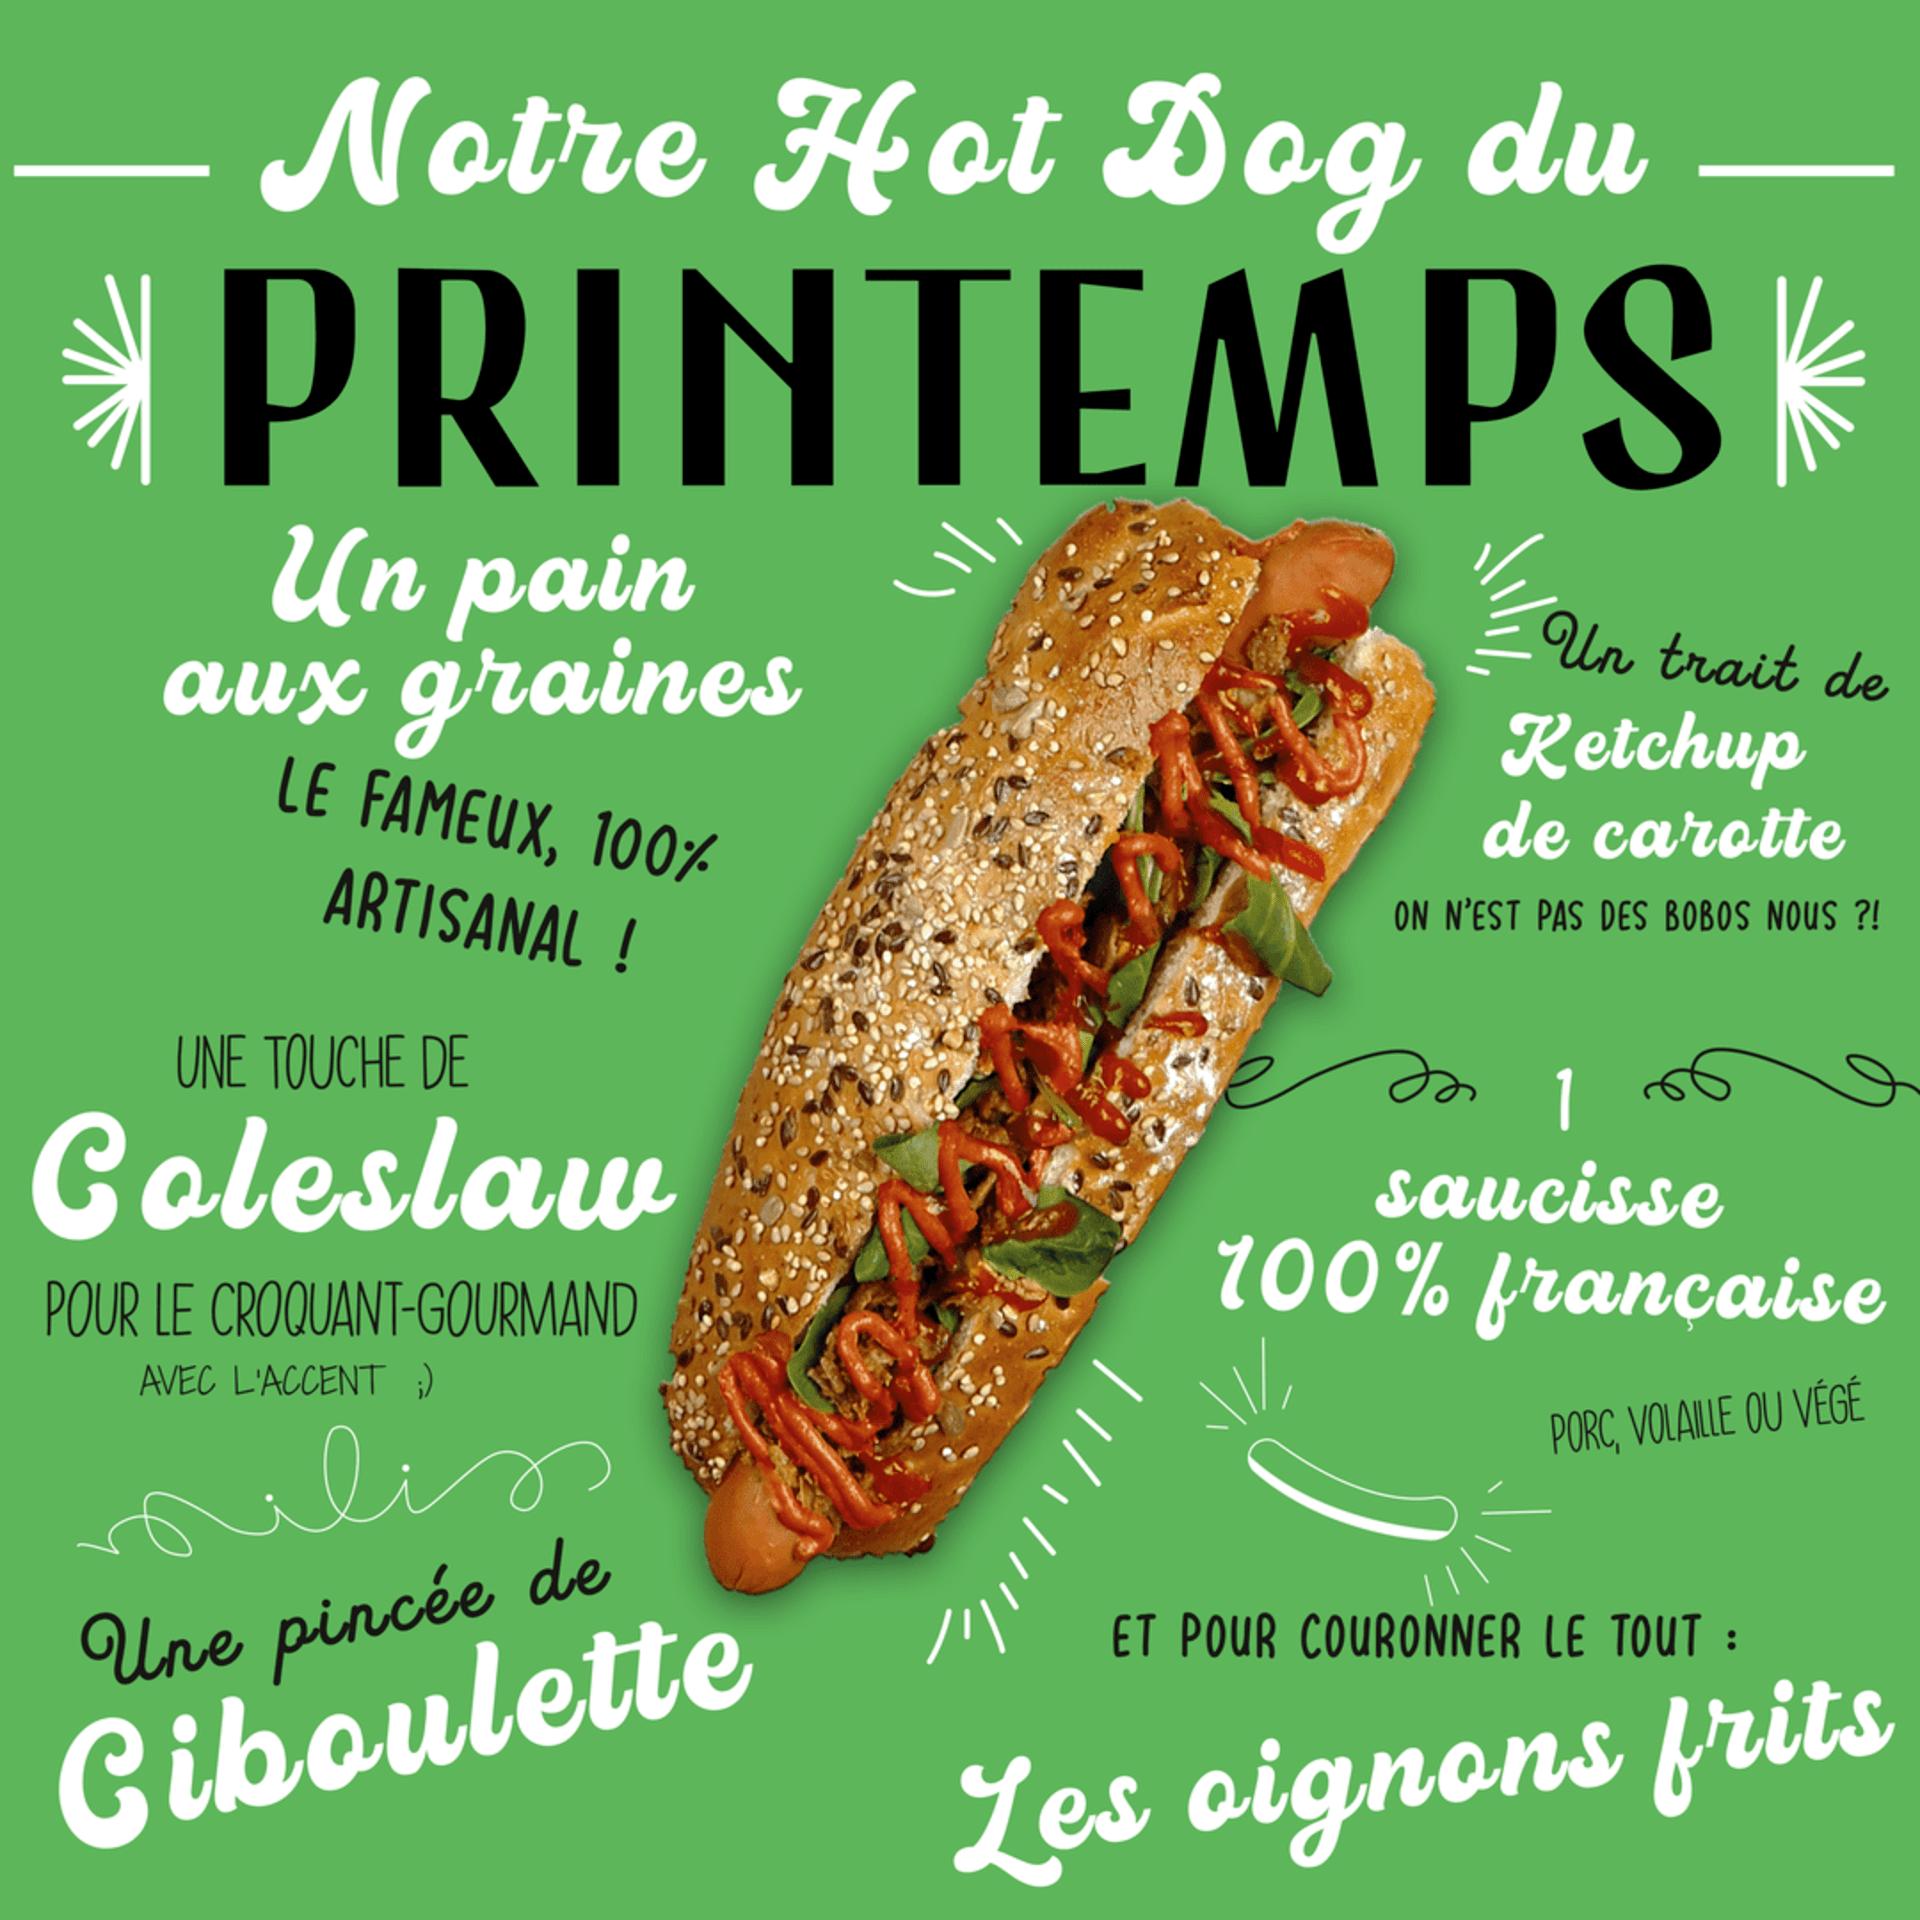 Hot dog du printemps